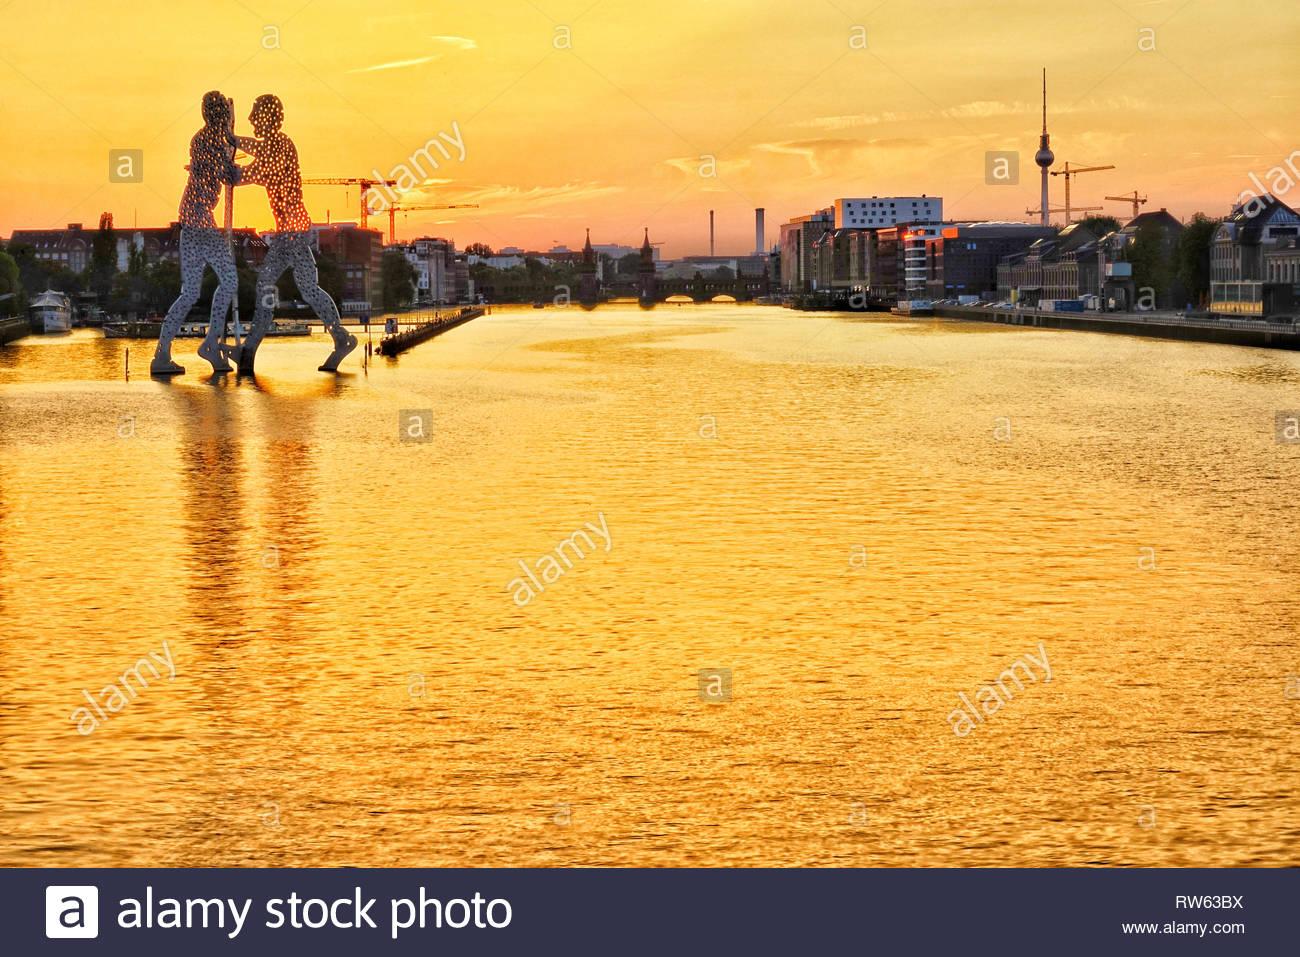 Berlin molecule man at sunset - Stock Image